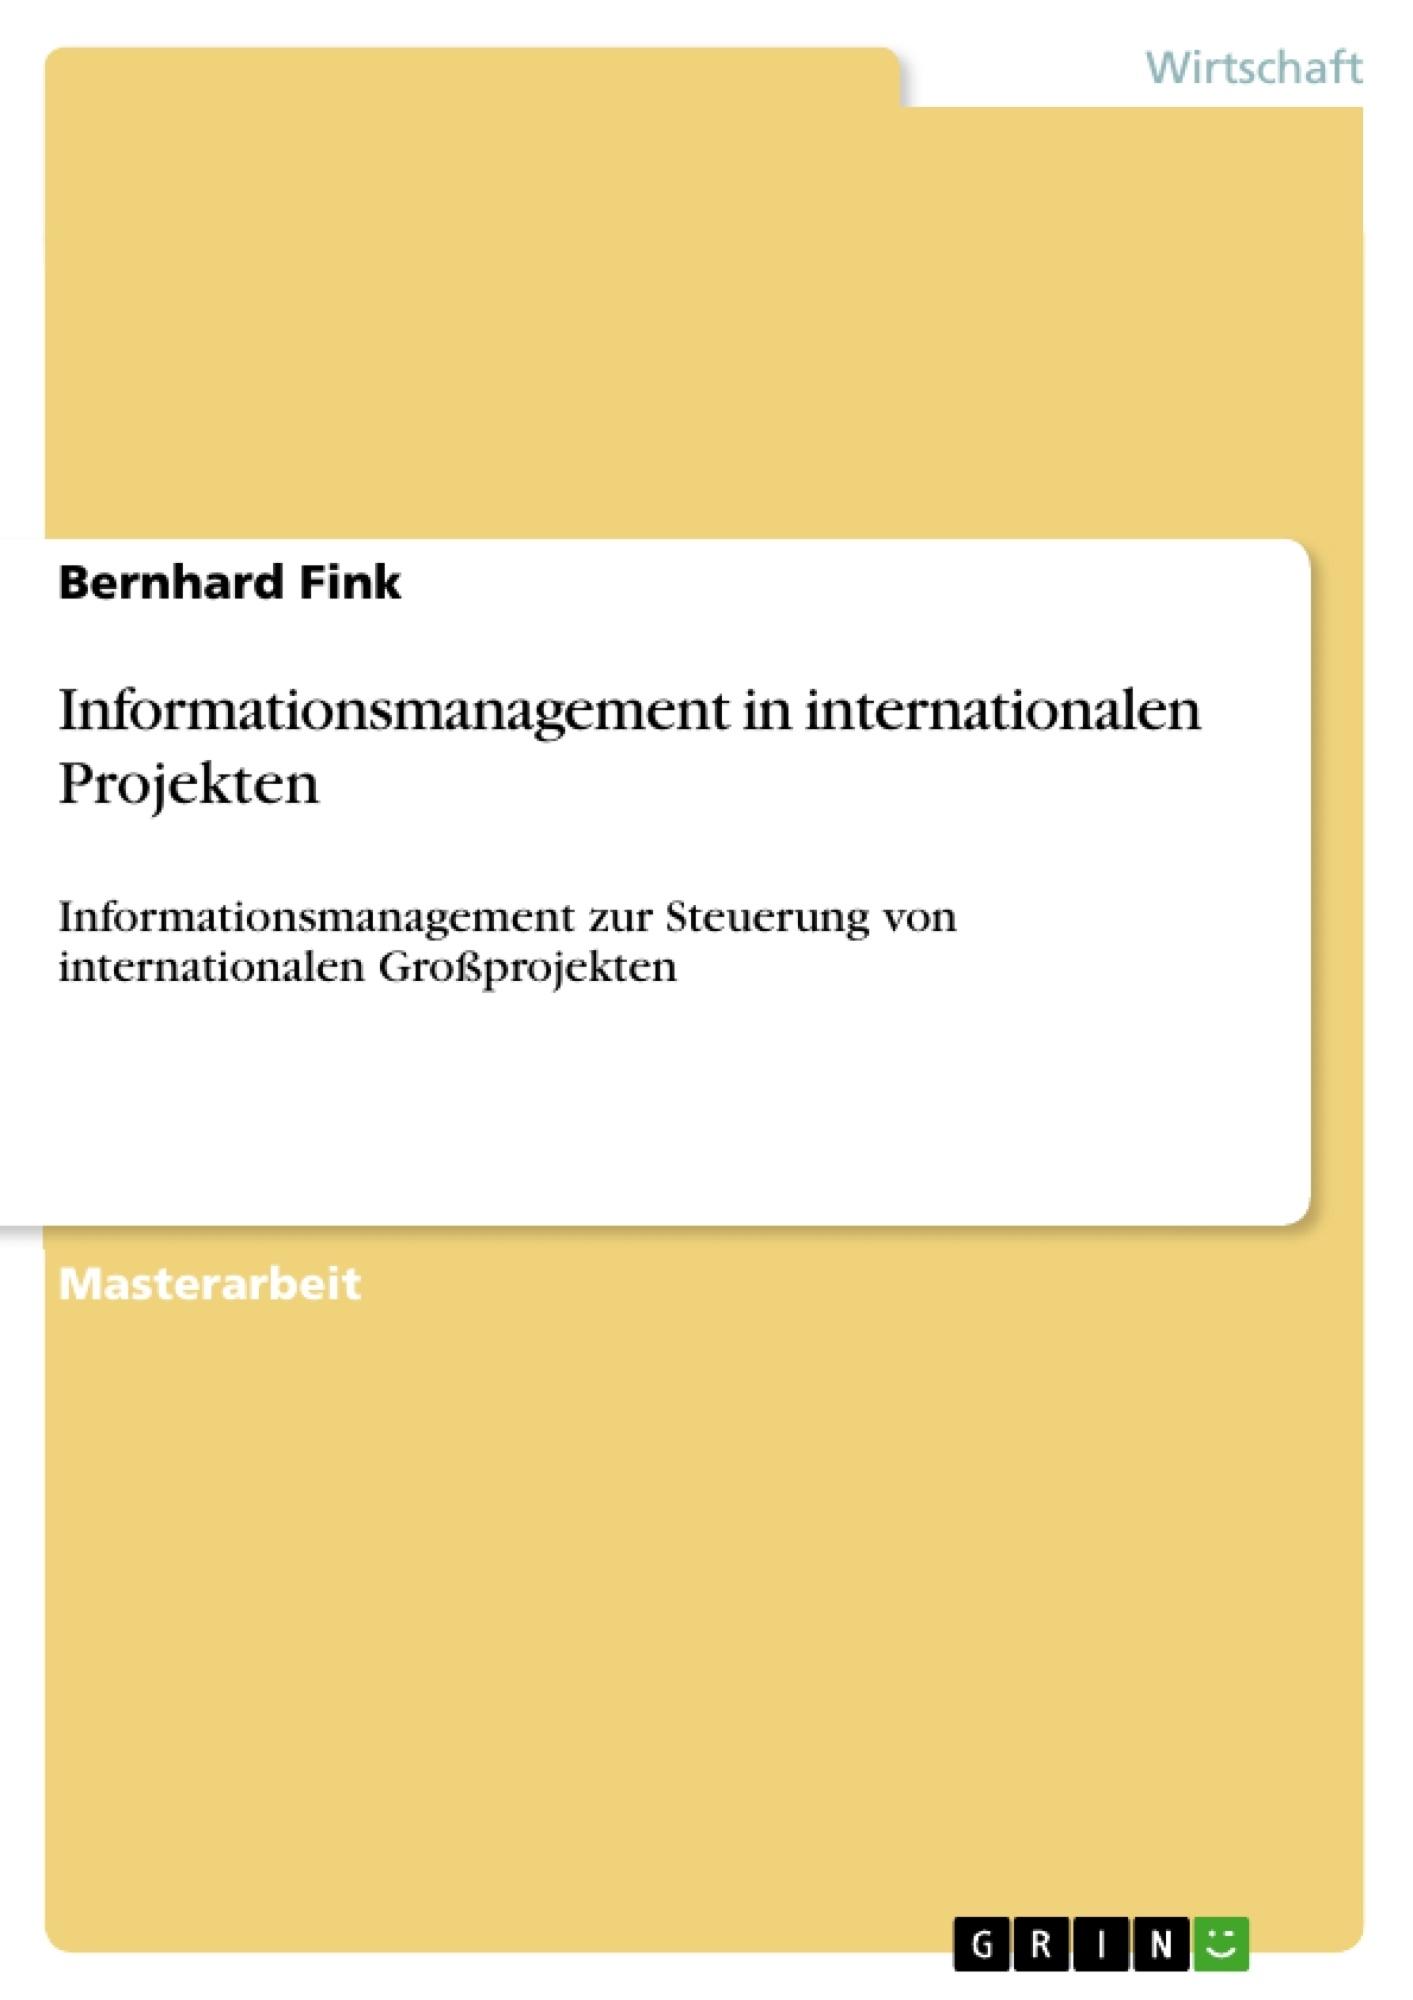 Titel: Informationsmanagement in internationalen Projekten